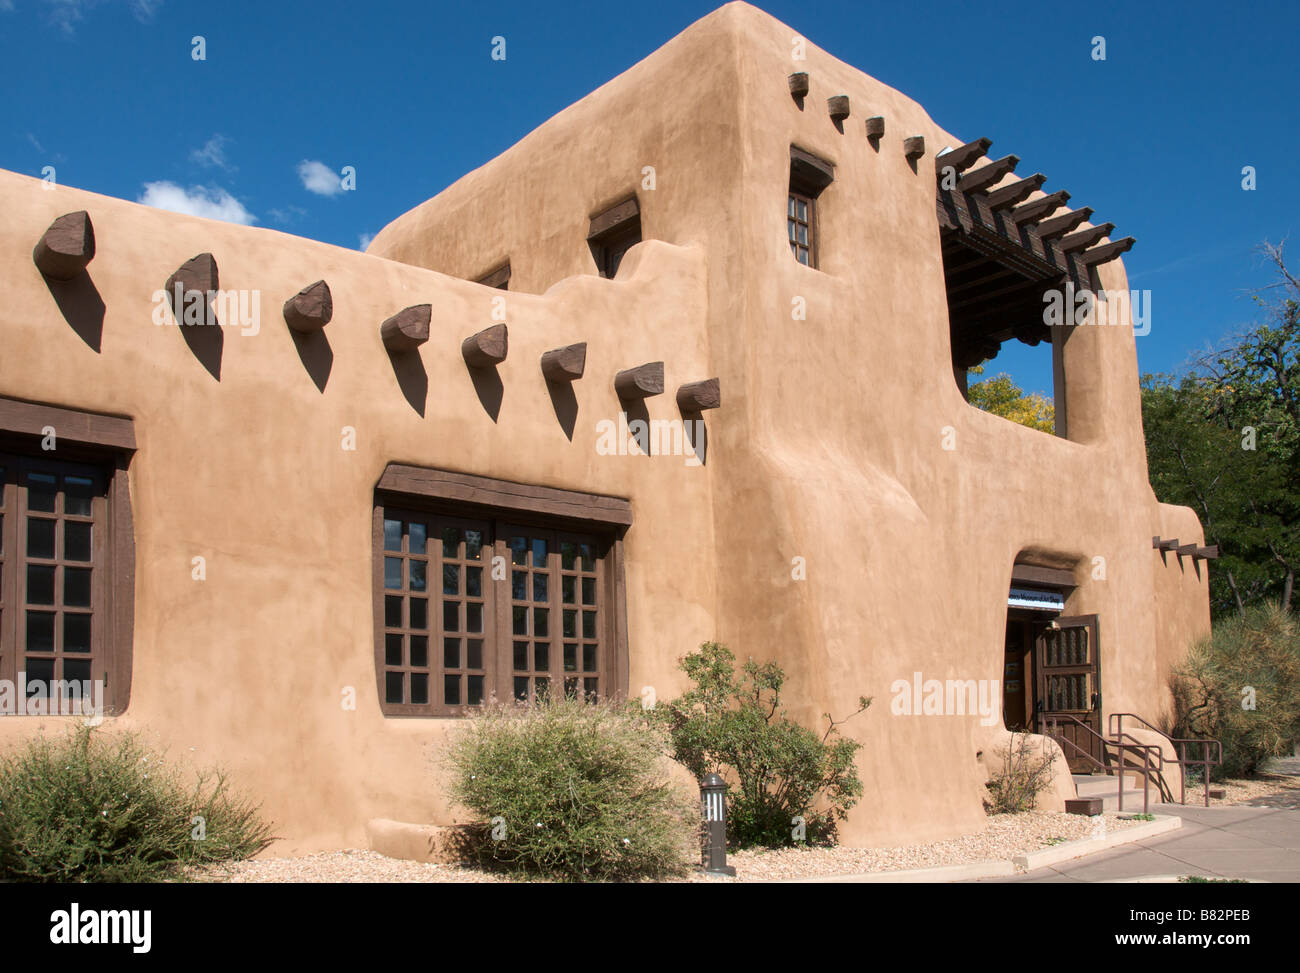 Typical adobe architecture exterior Fine Arts Museum Santa Fe New Mexico USA - Stock Image